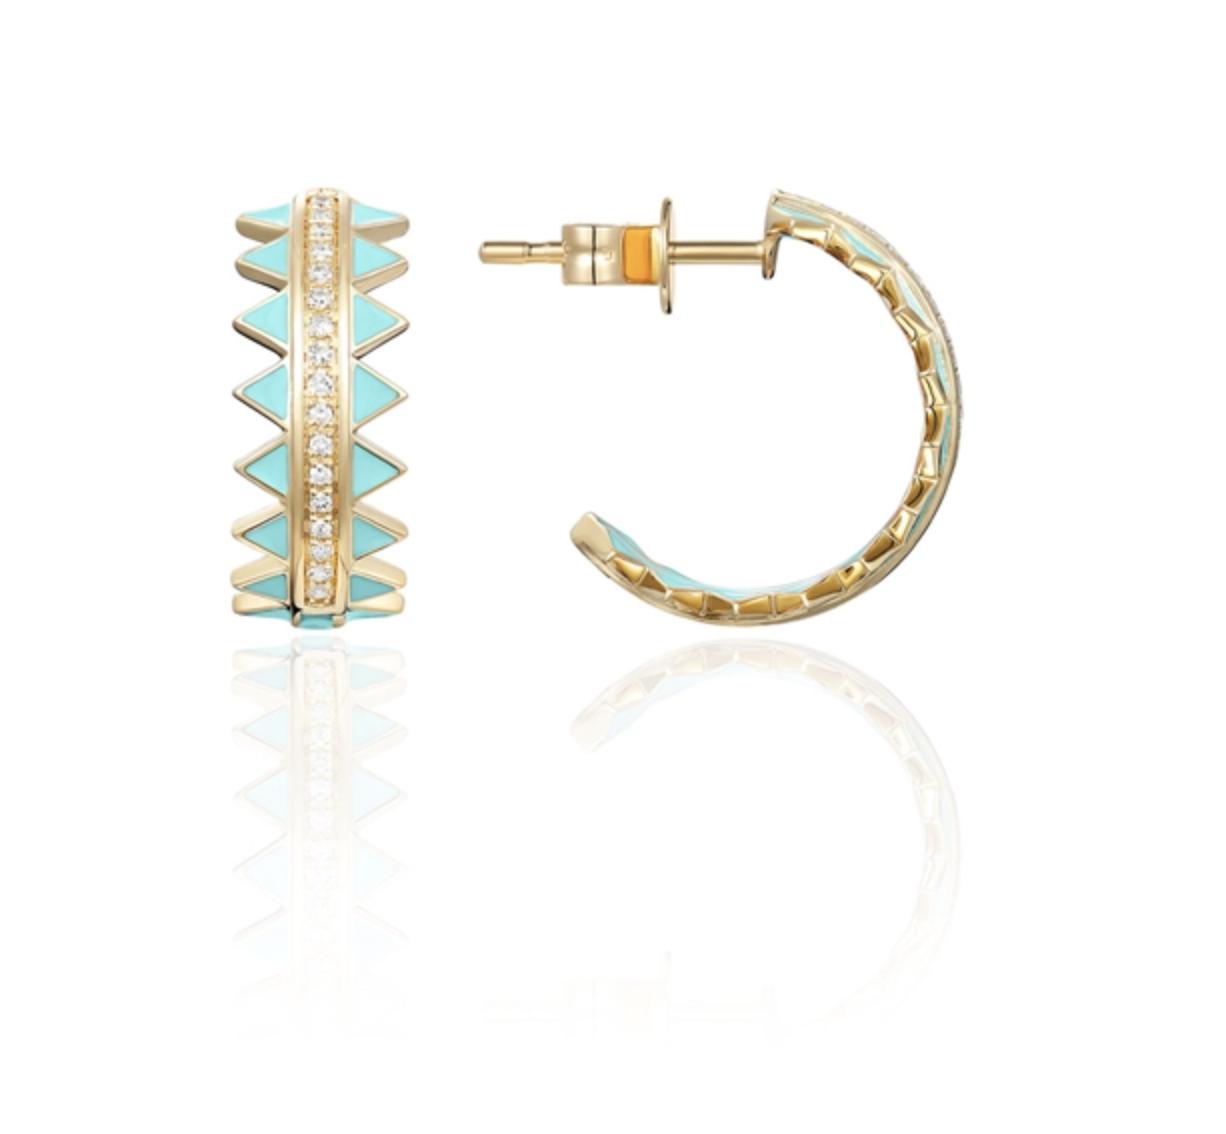 Turquoise Enamel & Diamond Hoop Earrings